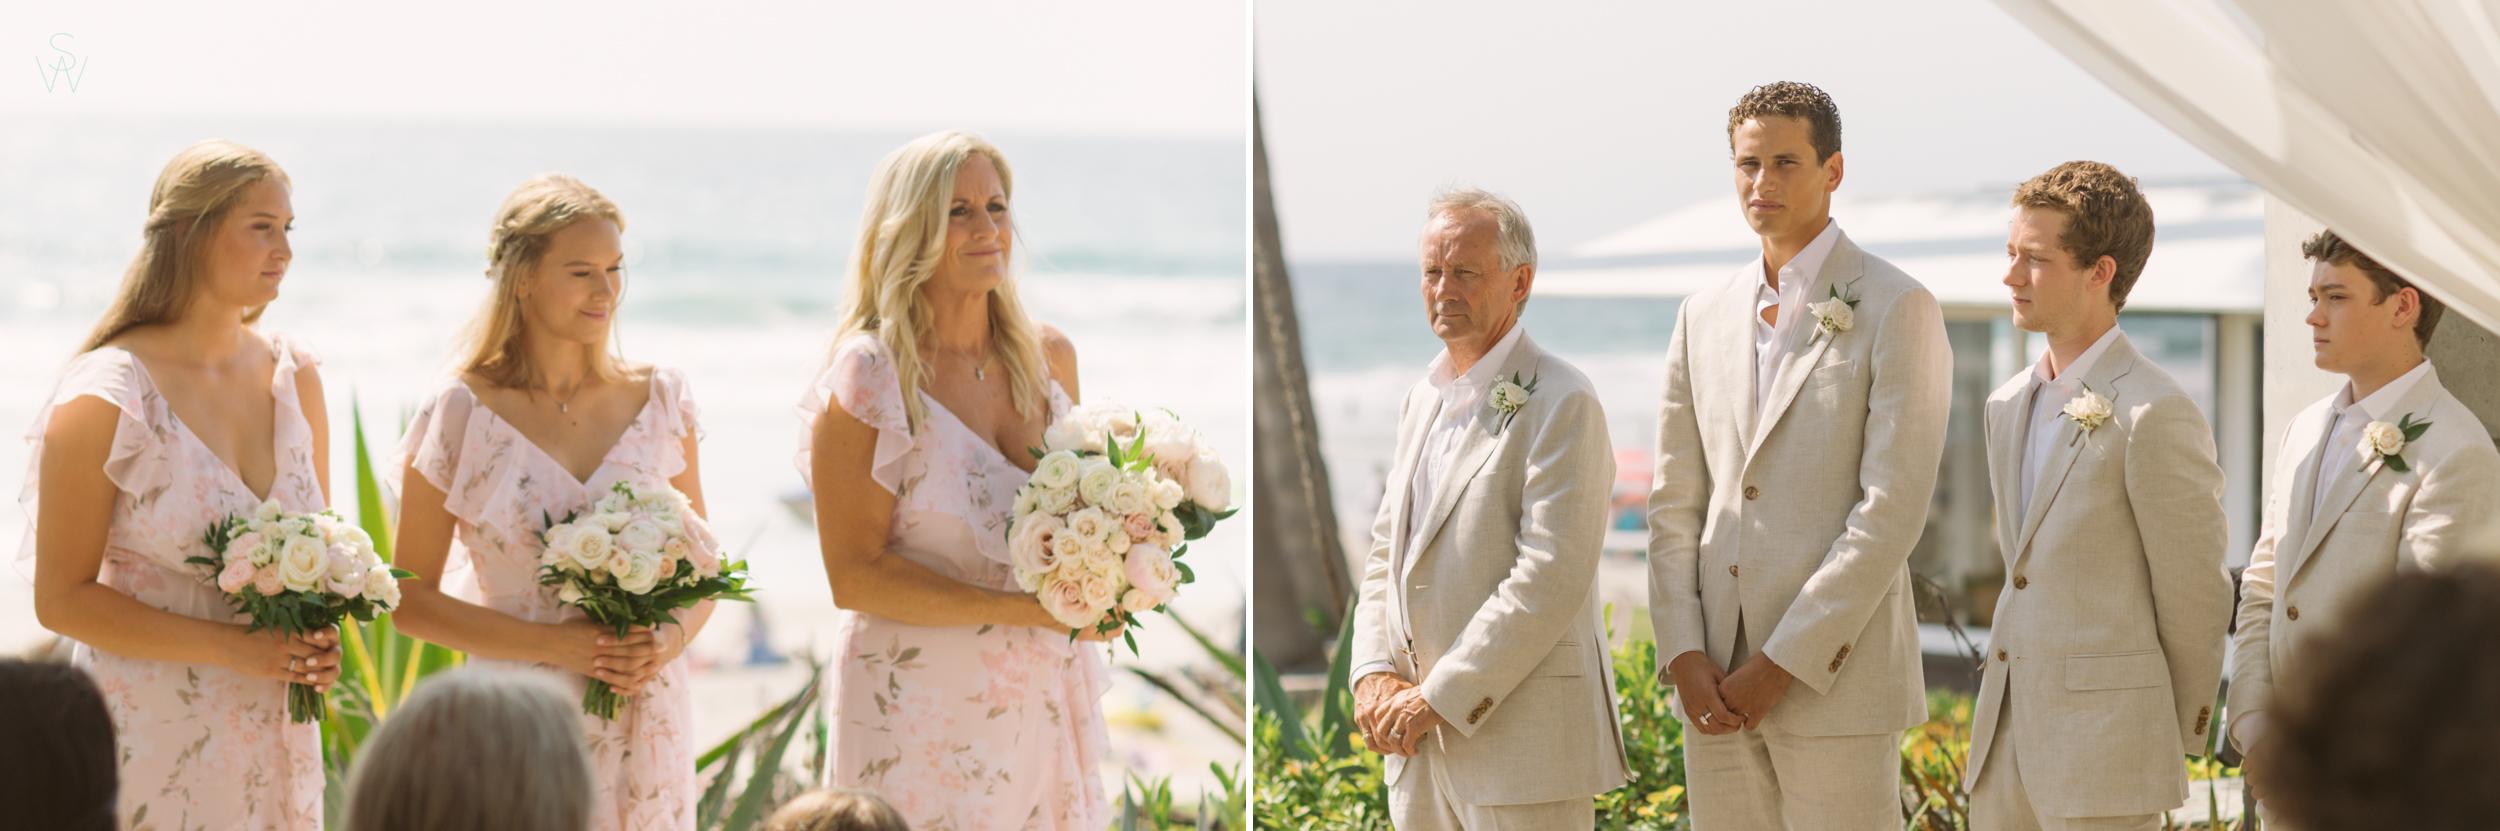 115DEL.MAR.WEDDINGS.photography.Bridesmaidsandgroomsmanshewanders.JPG